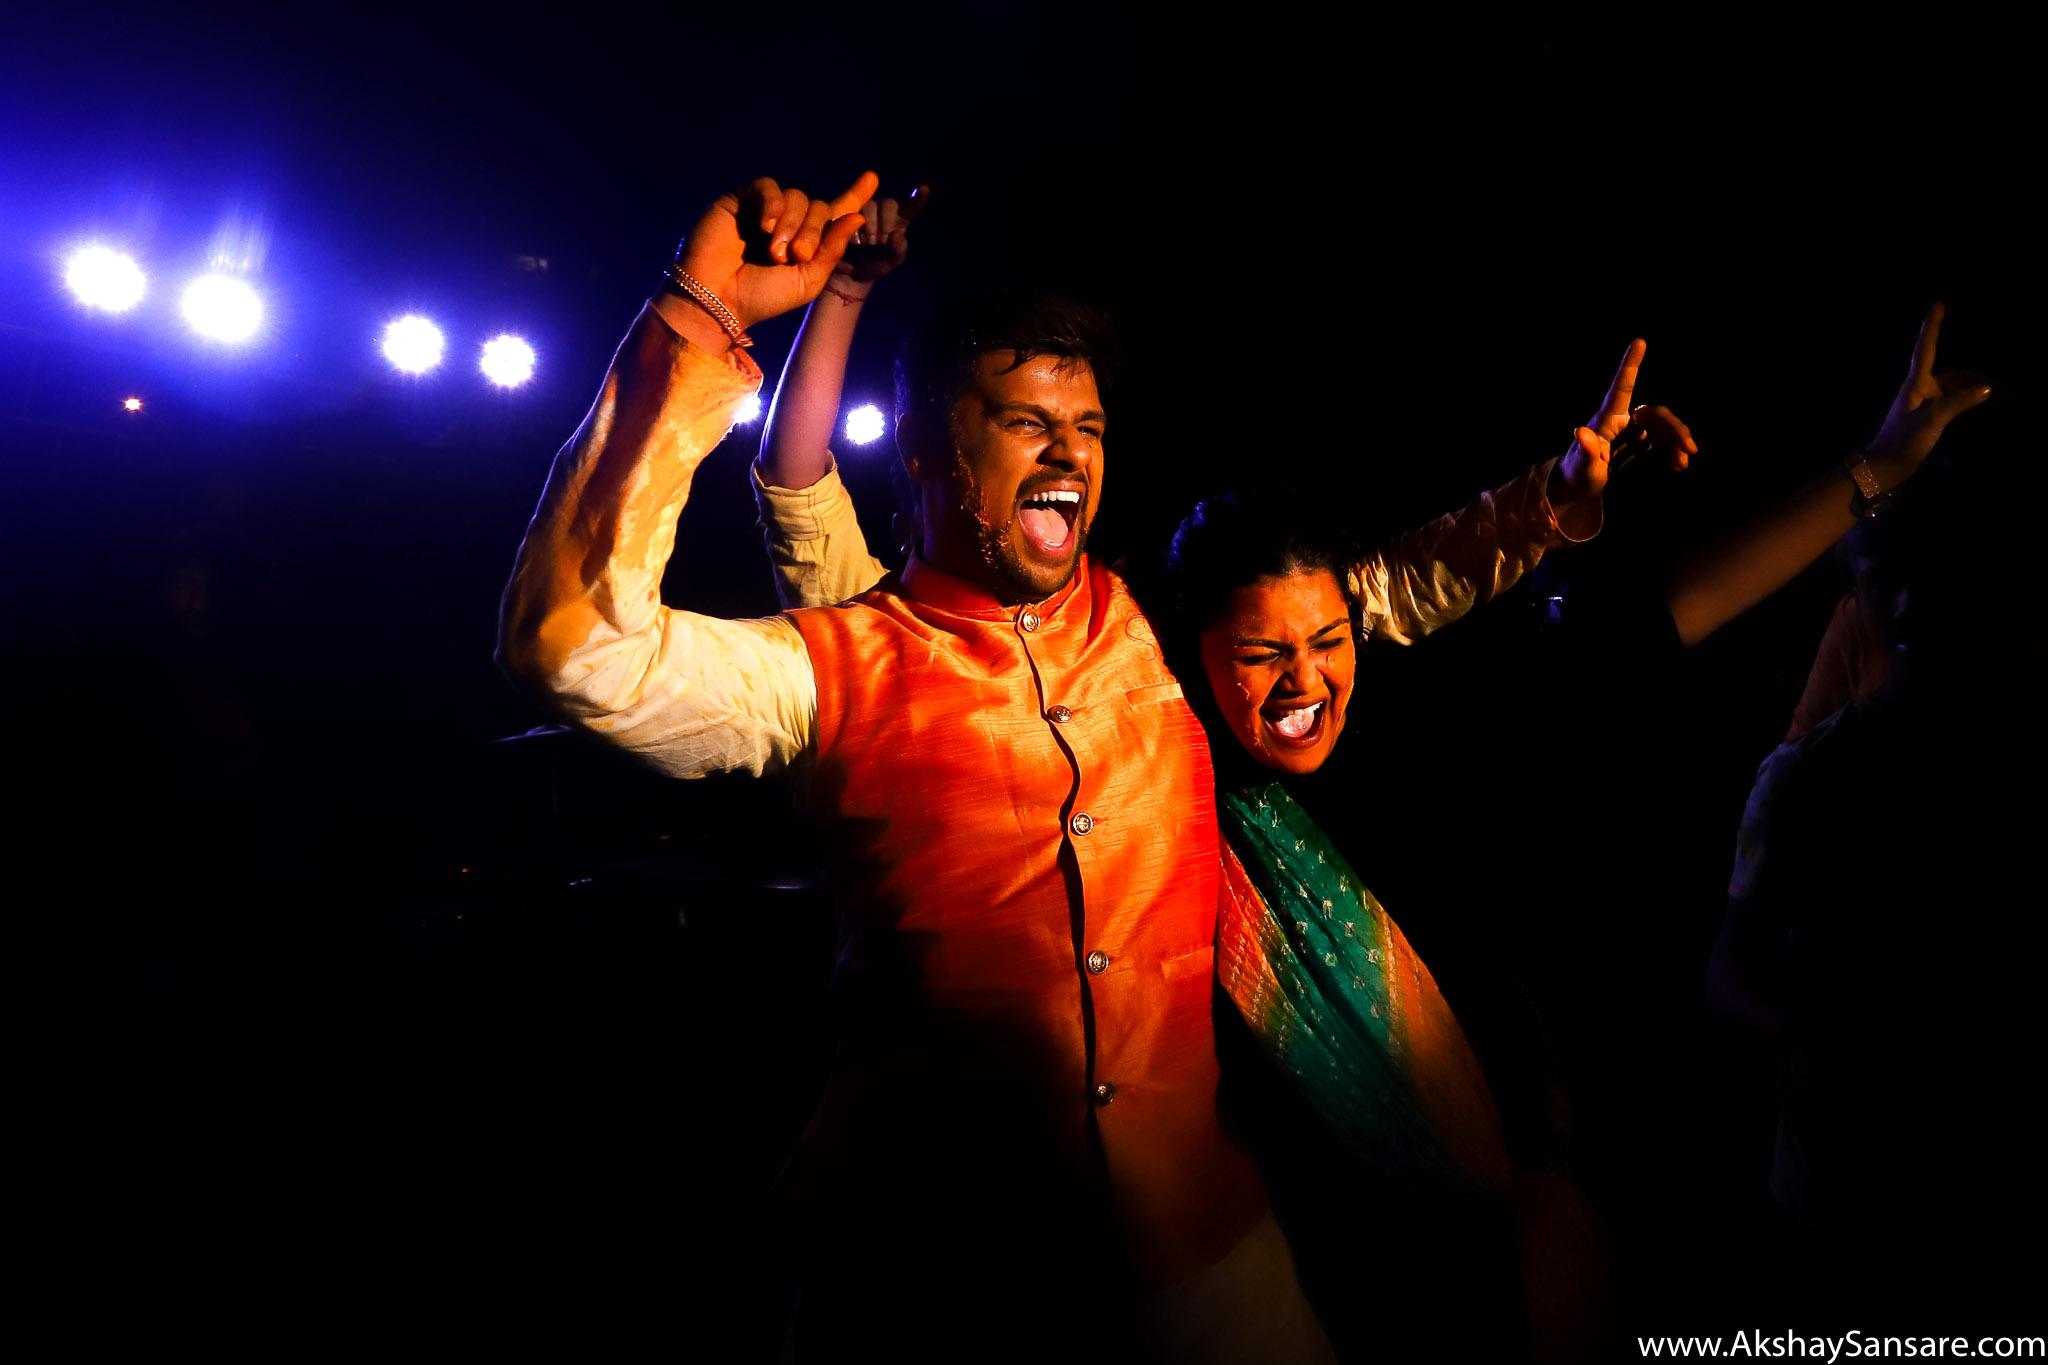 Aditya x Poonam Blog Akshay Sansare Photography Candid Photographer in Mumbai Best Cinematic wedding film filmer-6.jpg